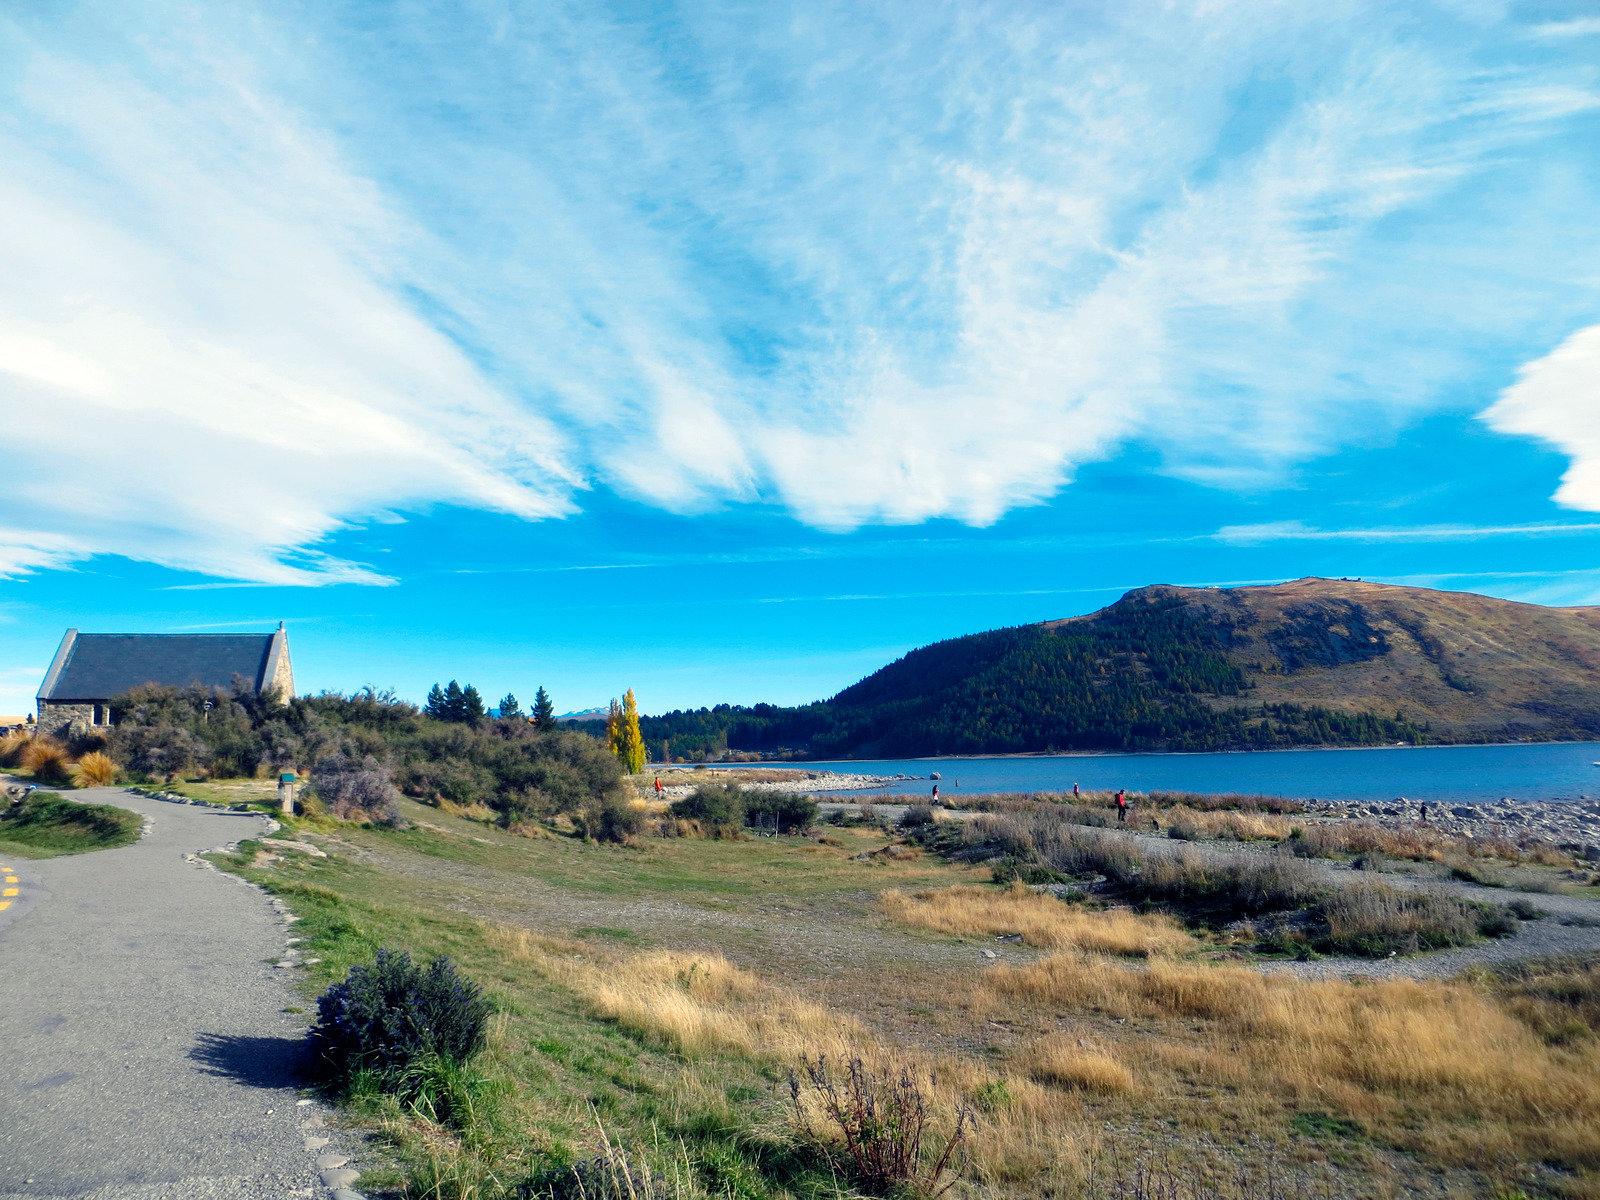 Lake Tekapo mit Church of the Good Shepherd